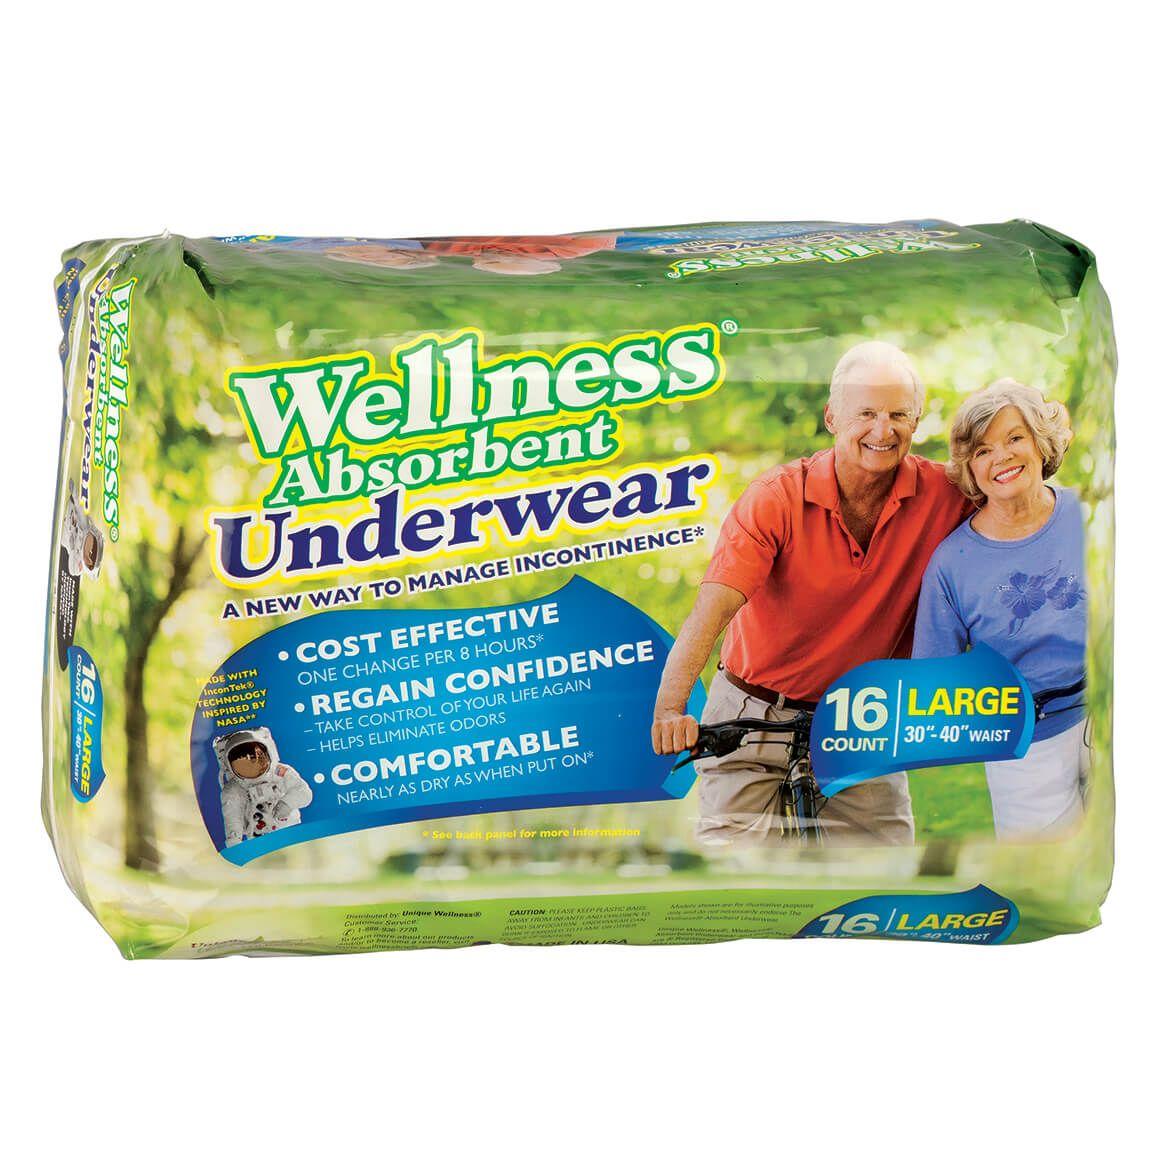 Wellness Absorbent Underwear, pkg.-348262